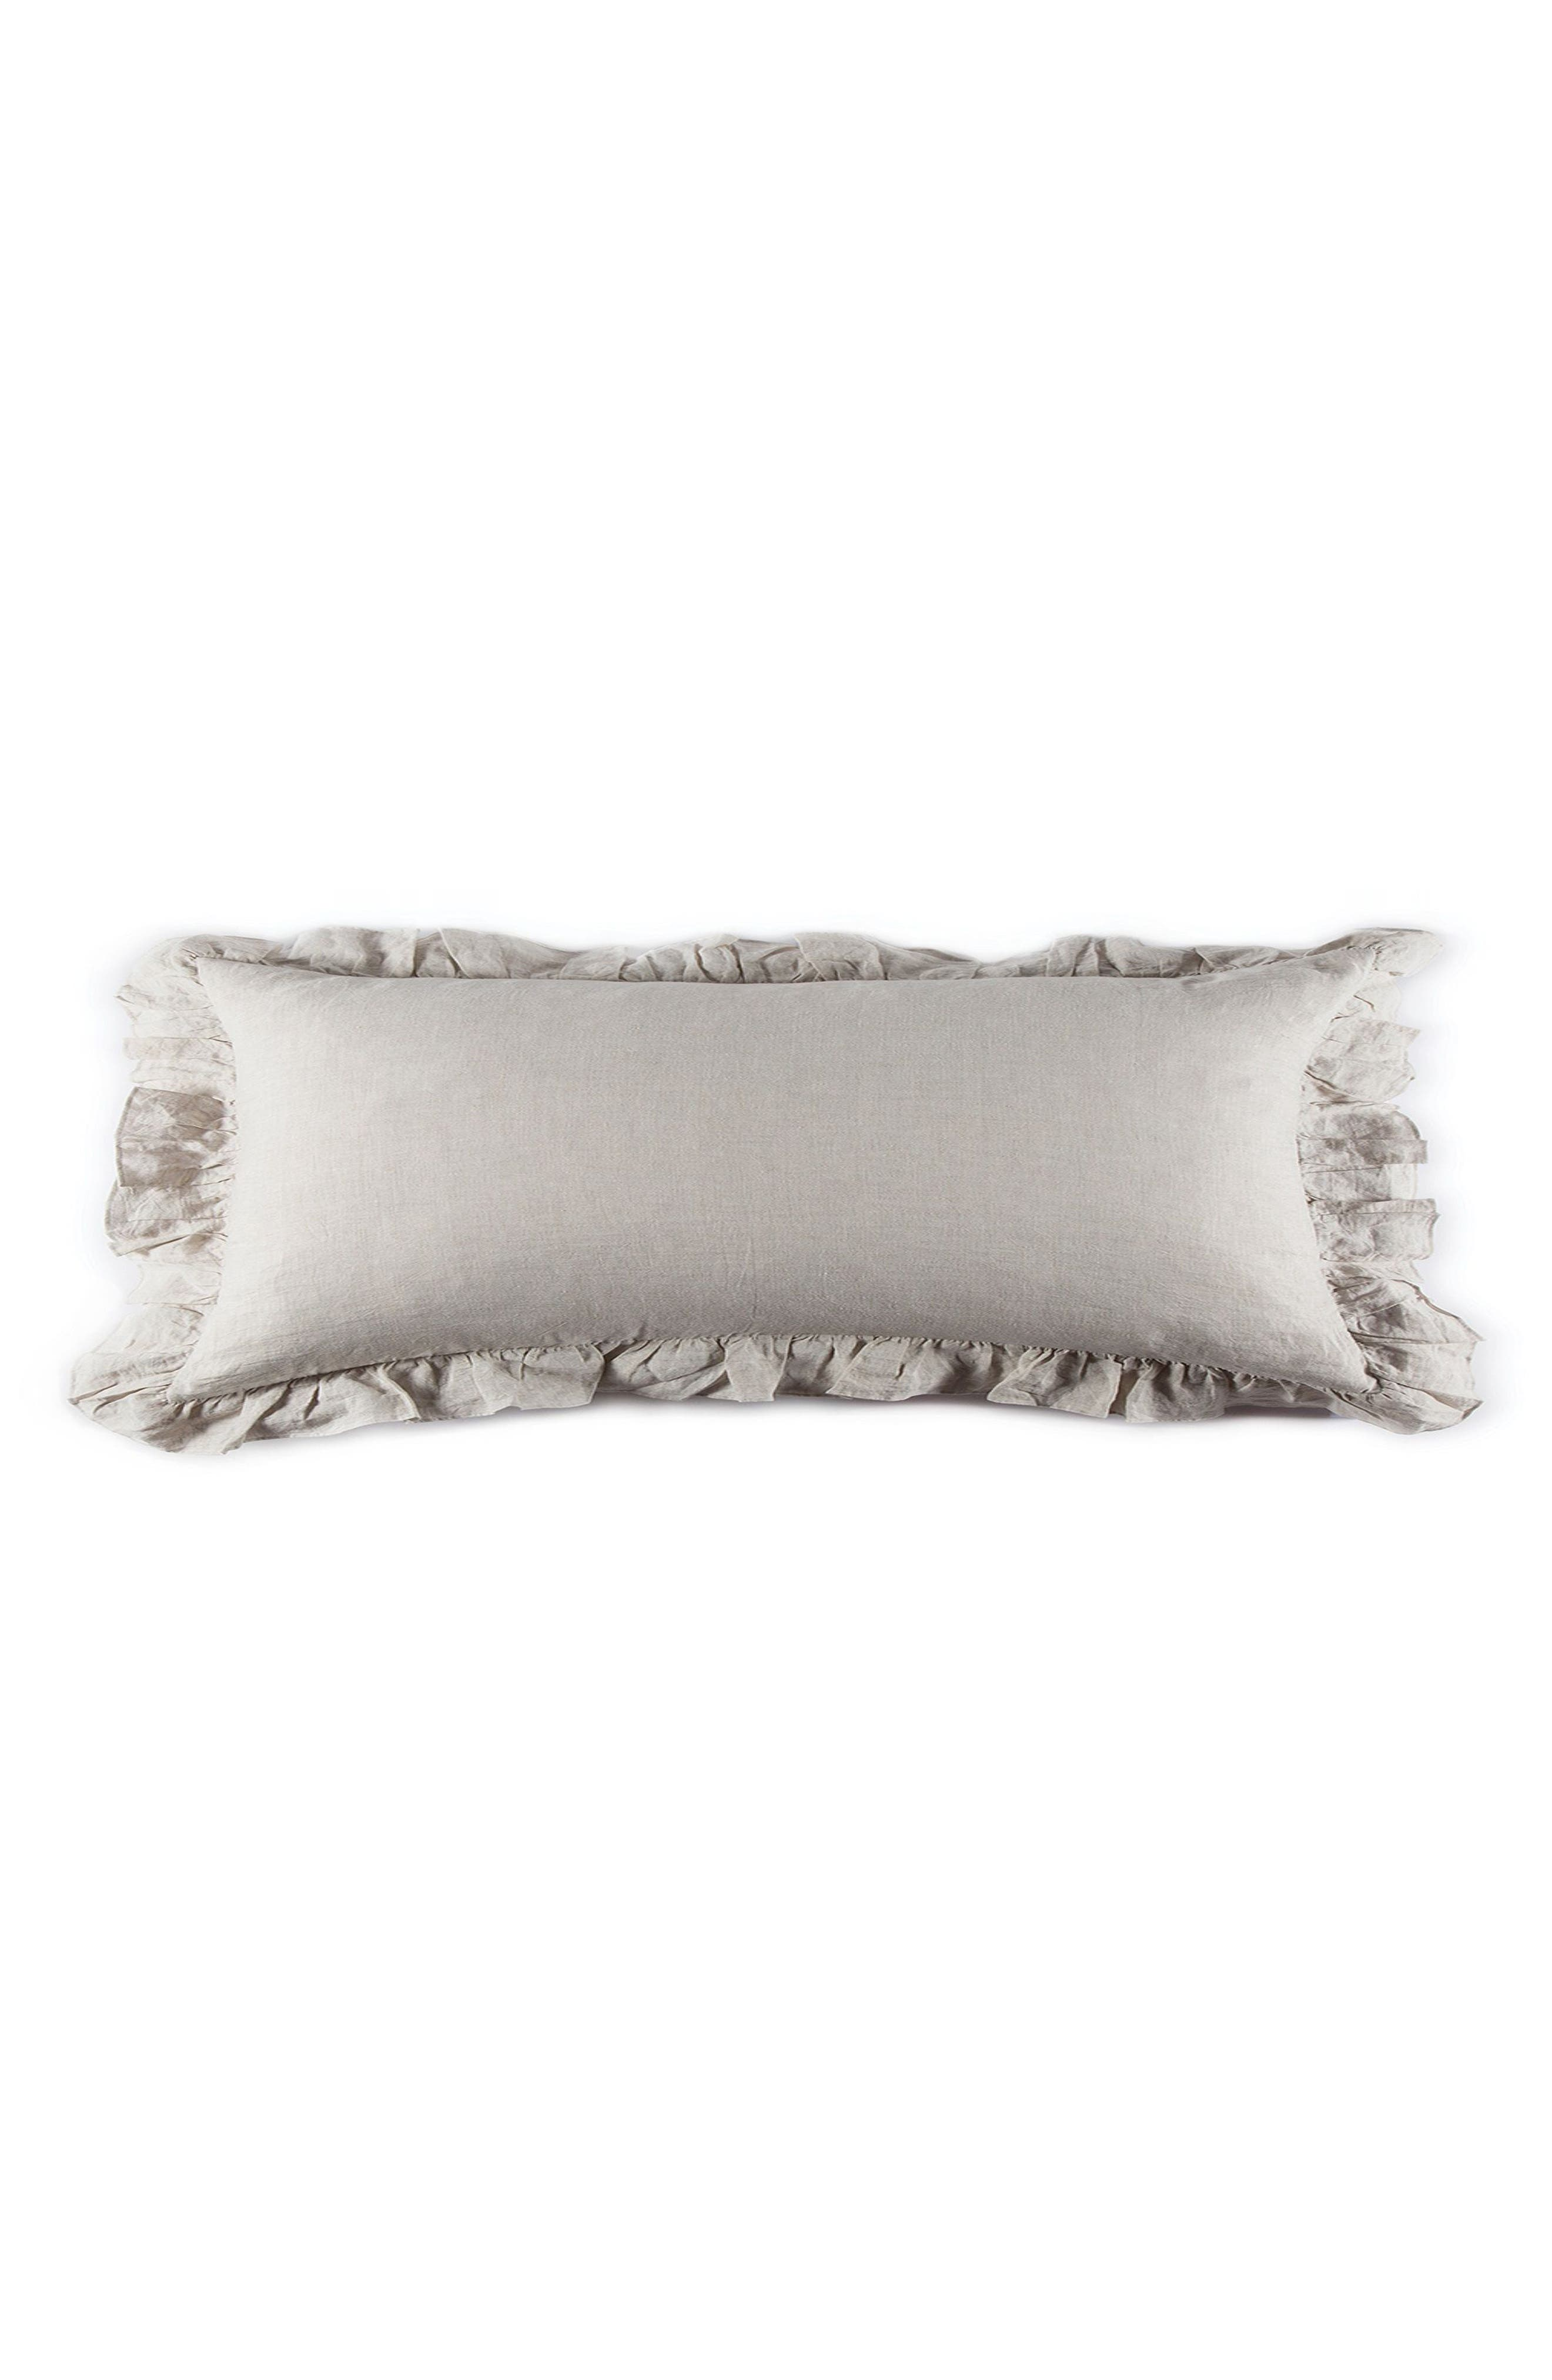 Pom Pom at Home Charlie Body Pillow